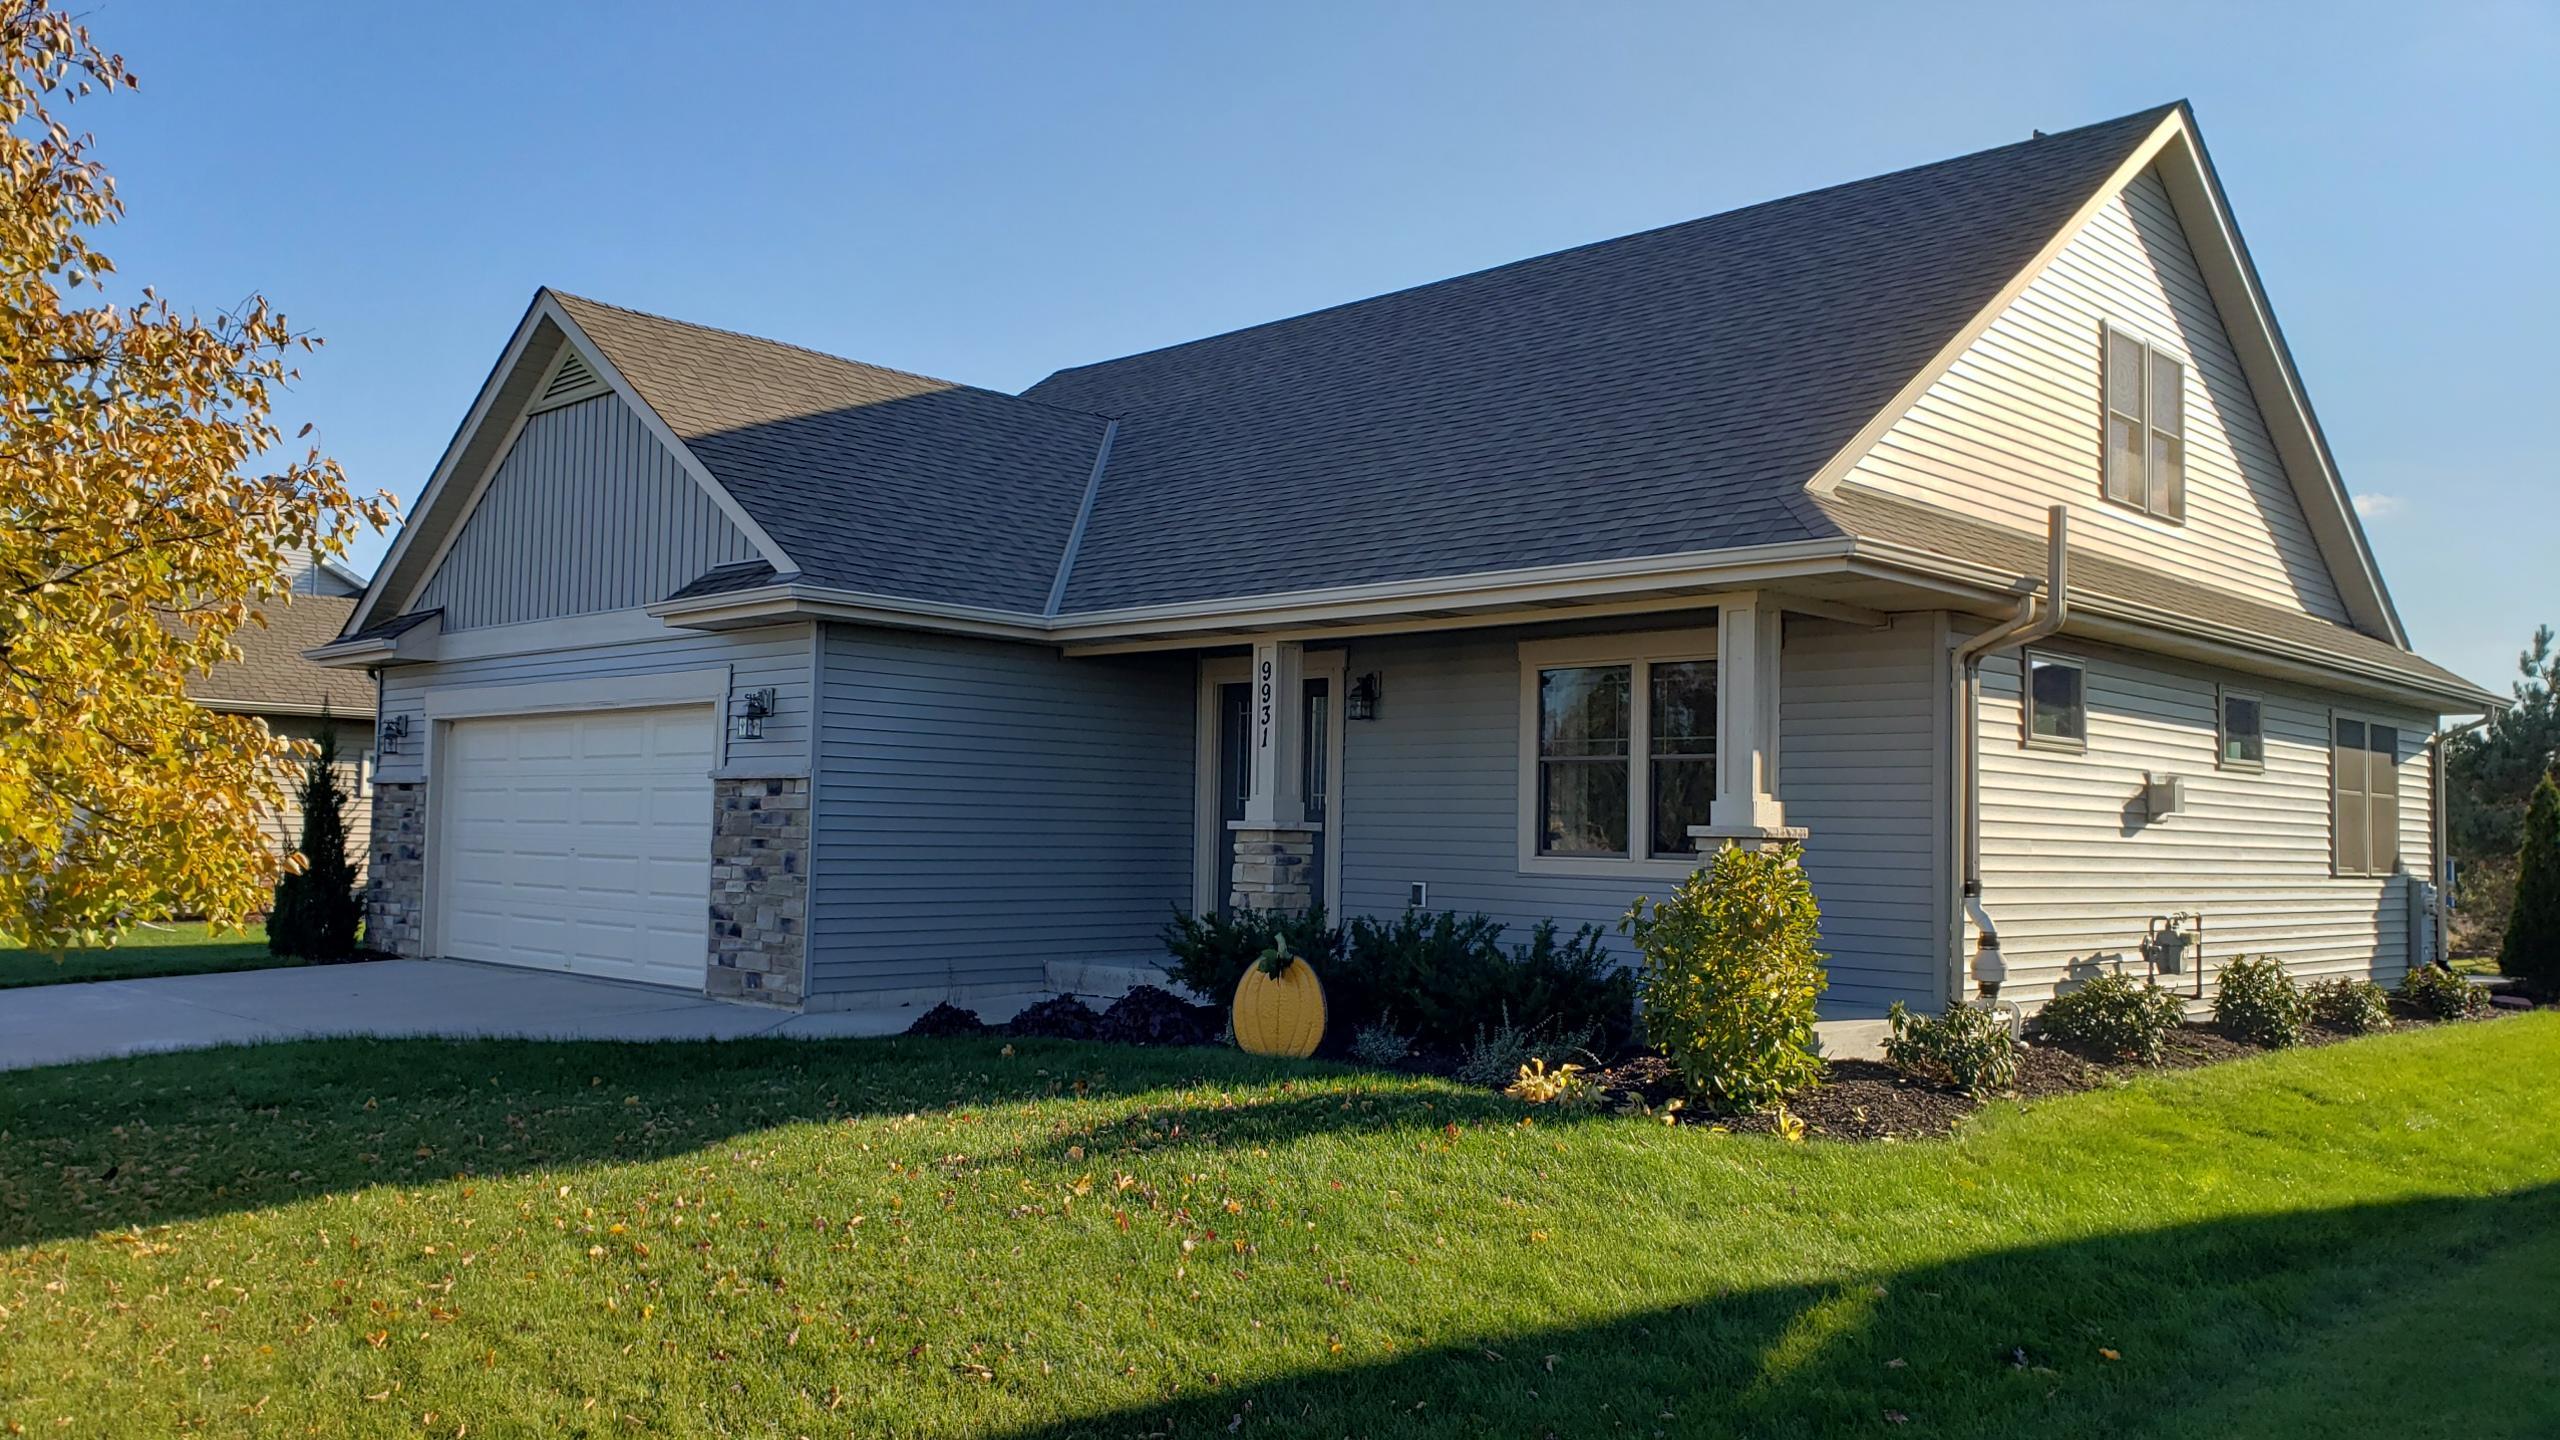 9931 Prairie Crossing Dr, Caledonia, Wisconsin 53126, 3 Bedrooms Bedrooms, ,2 BathroomsBathrooms,Single-Family,For Sale,Prairie Crossing Dr,1719915